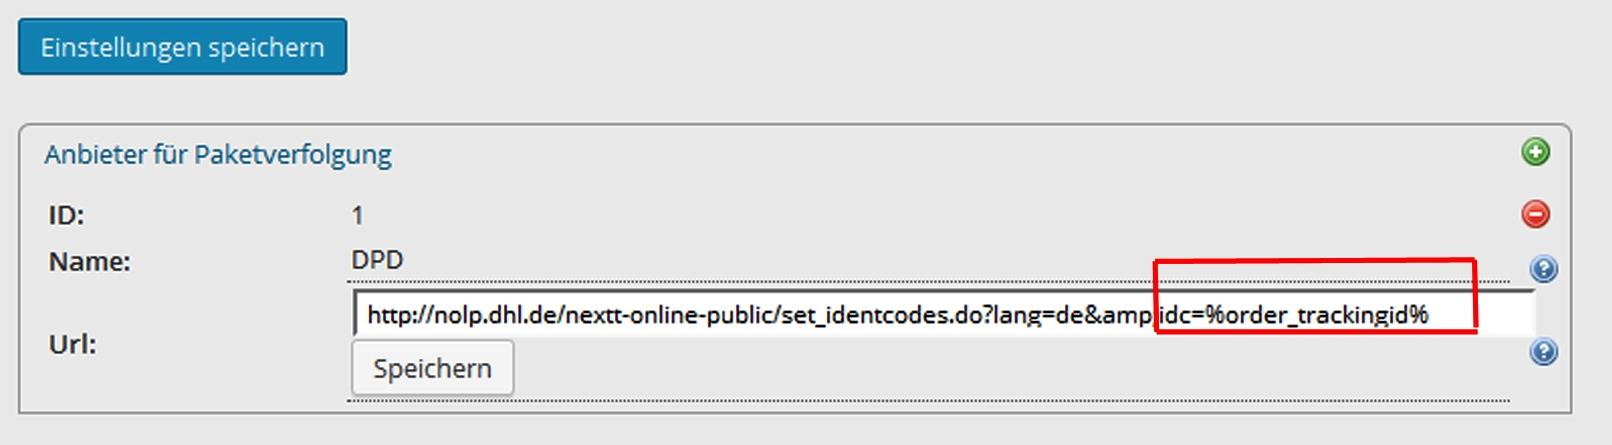 Nolp.Dhl.De/Nextt-Online-Public/Set_identcodes.Do?Lang=De&Idc=